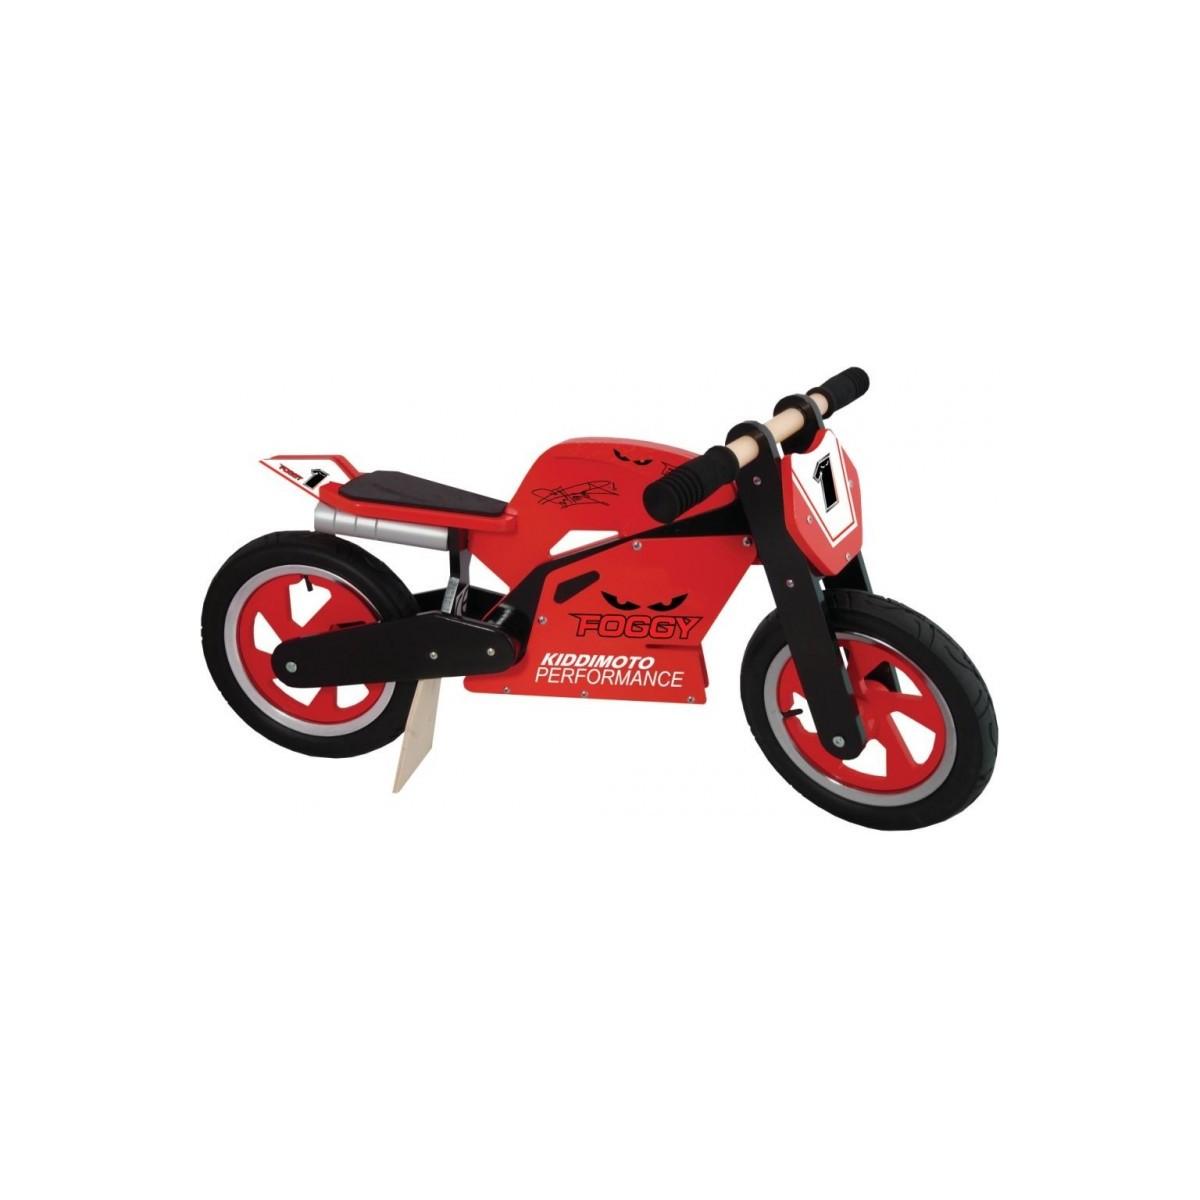 draisienne moto bois kiddimoto ducati carl fogarty moto. Black Bedroom Furniture Sets. Home Design Ideas